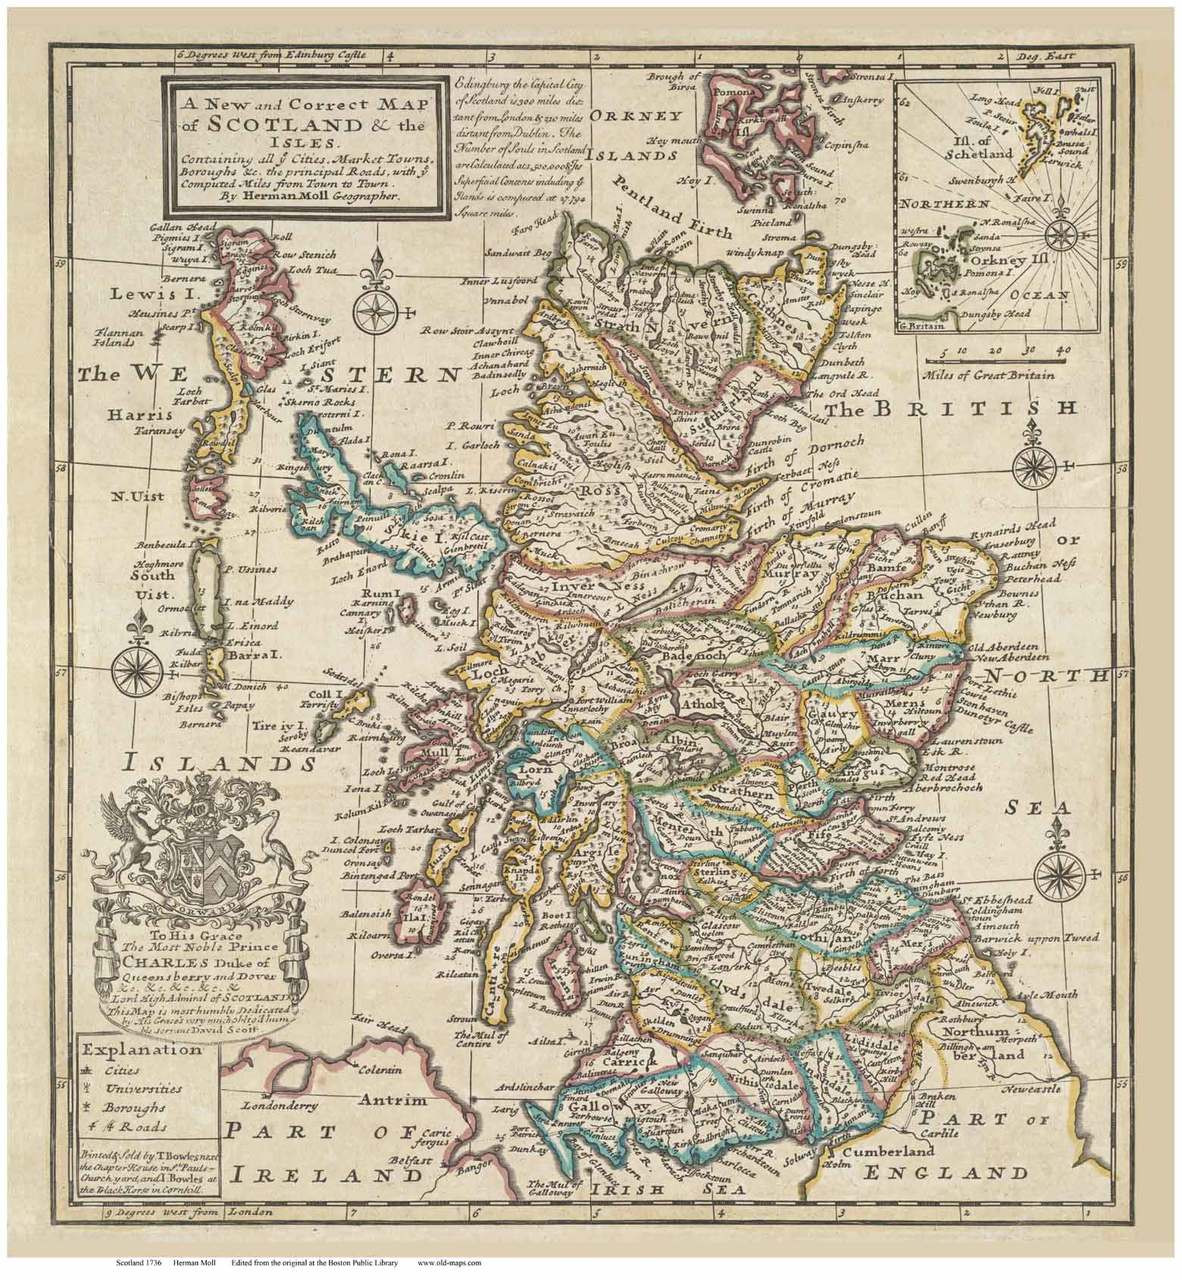 Scotland 1736 Moll - Old Map Reprint